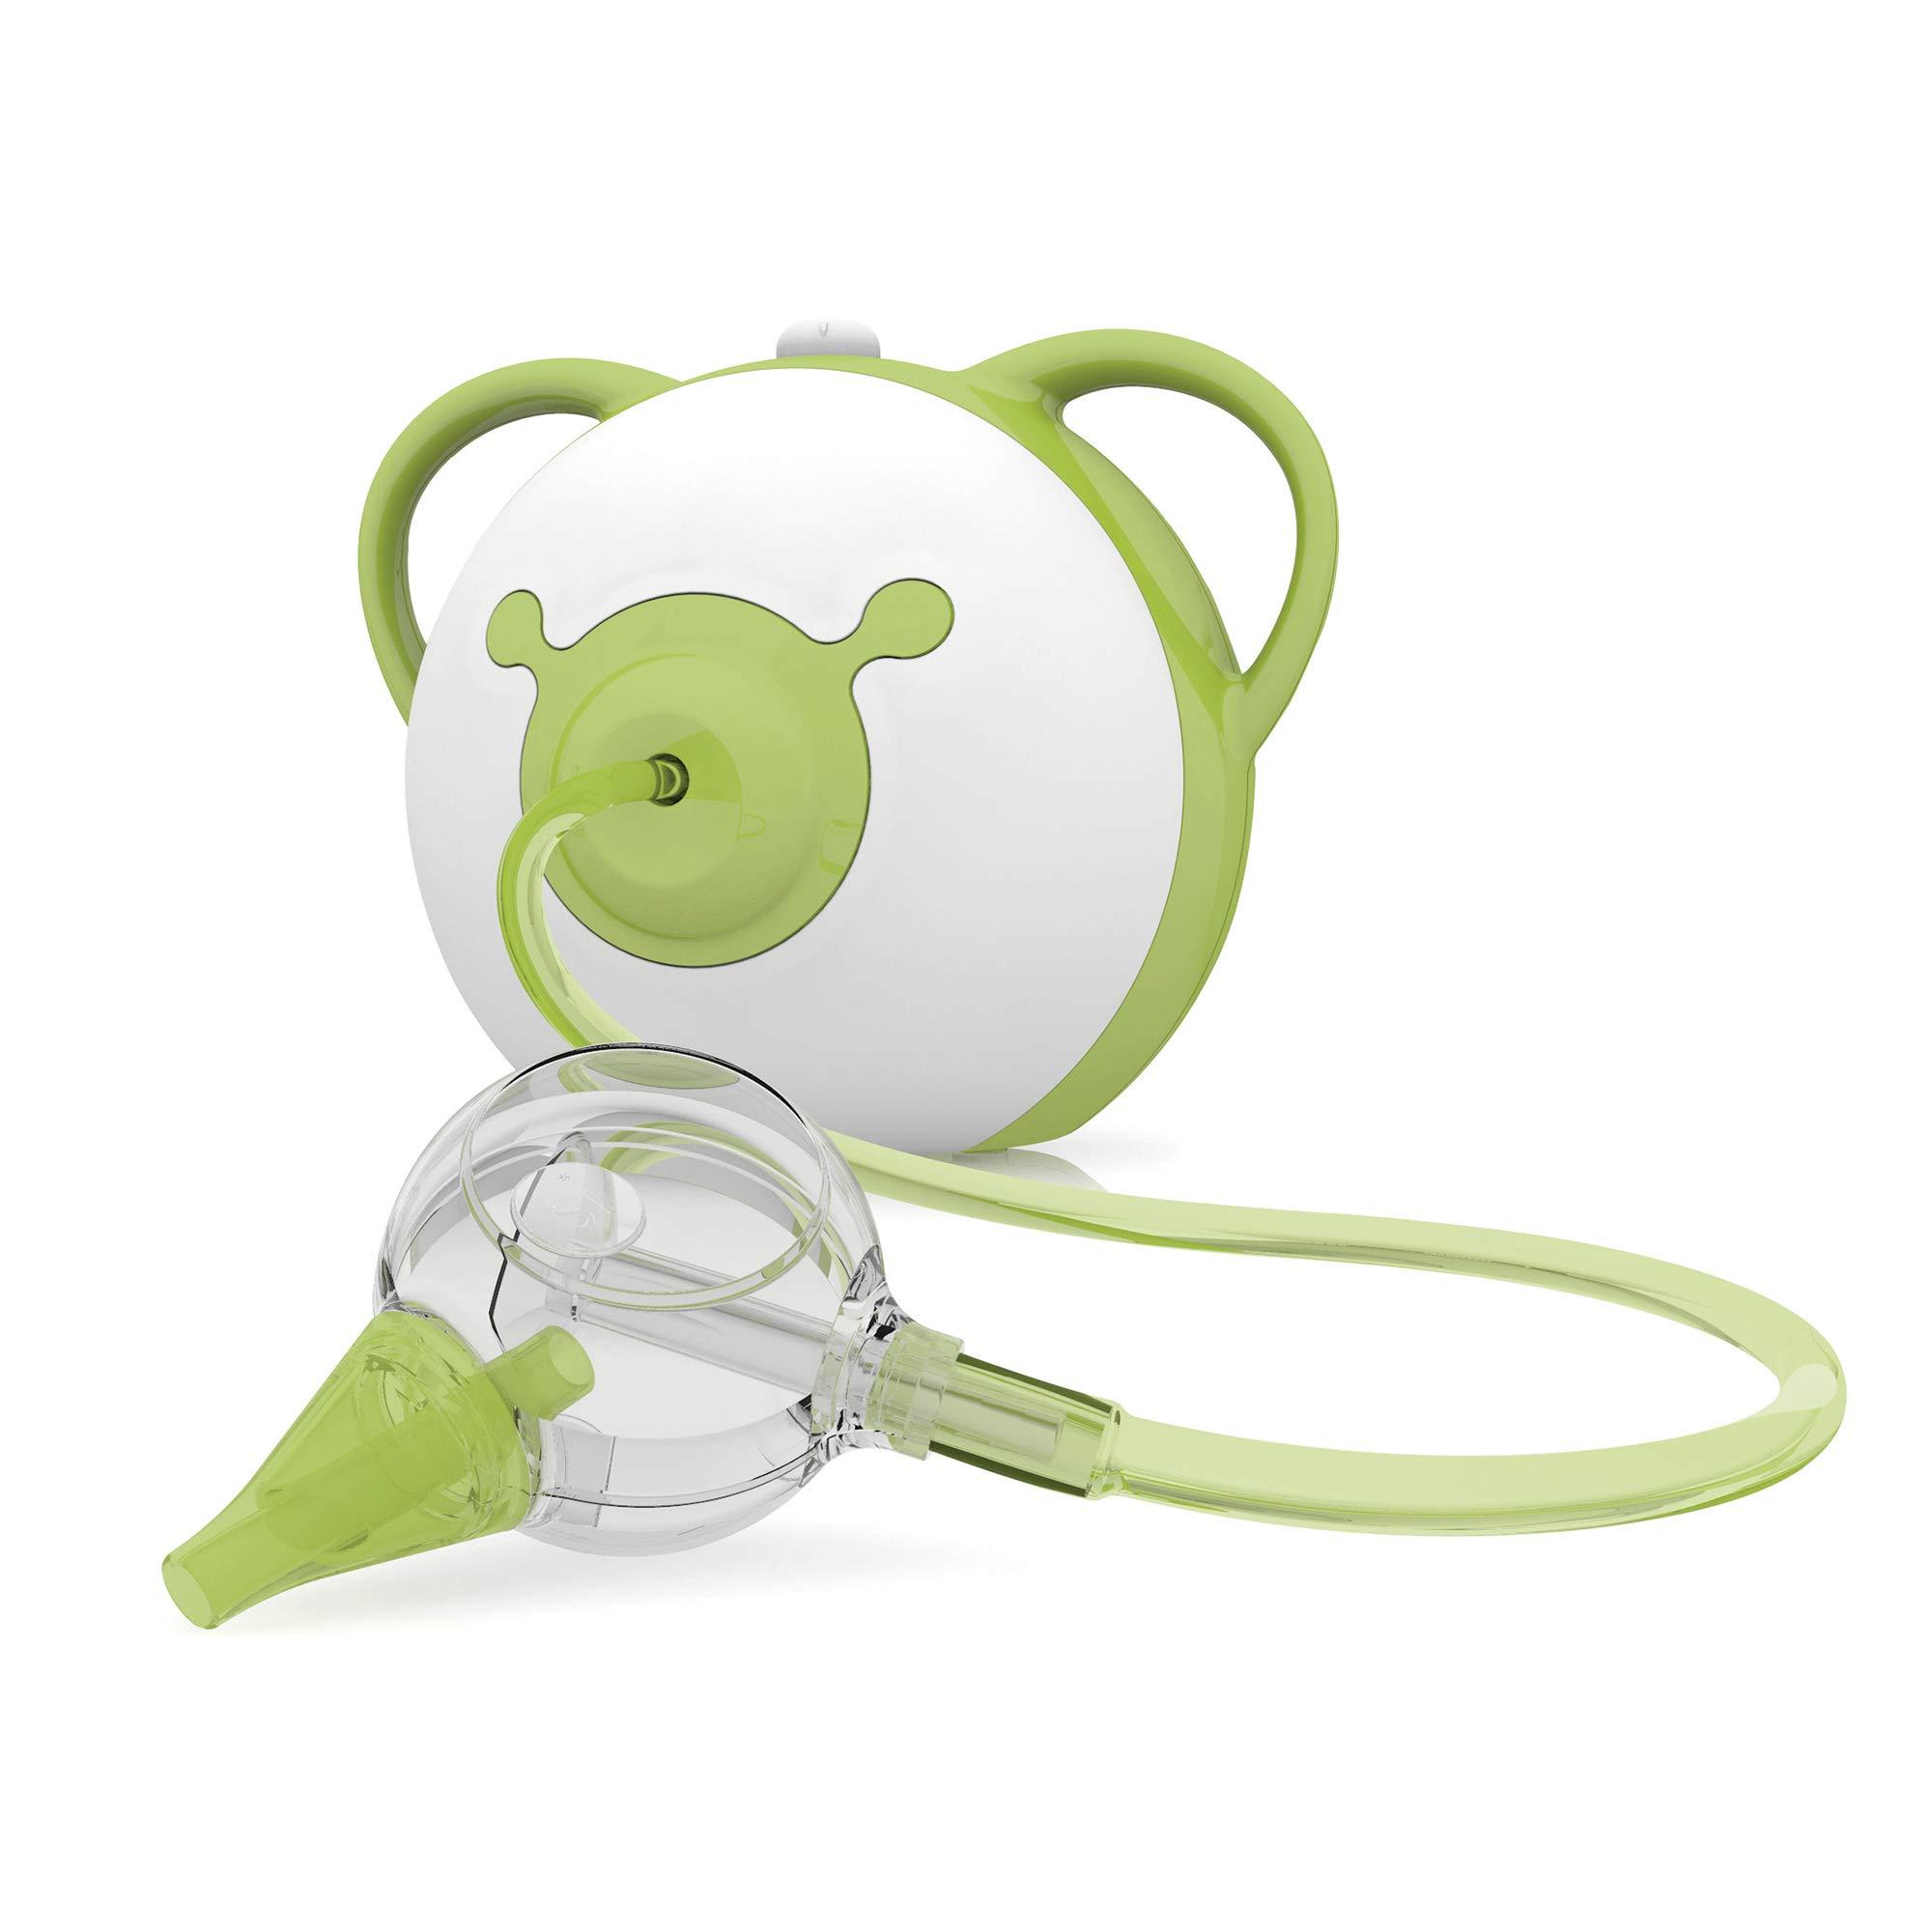 Nosiboo Pro Baby Electric Nasal Aspirator/Nose Sucker - 110V Nose Cleaner - Adjustable Nose Suction Power (Green)